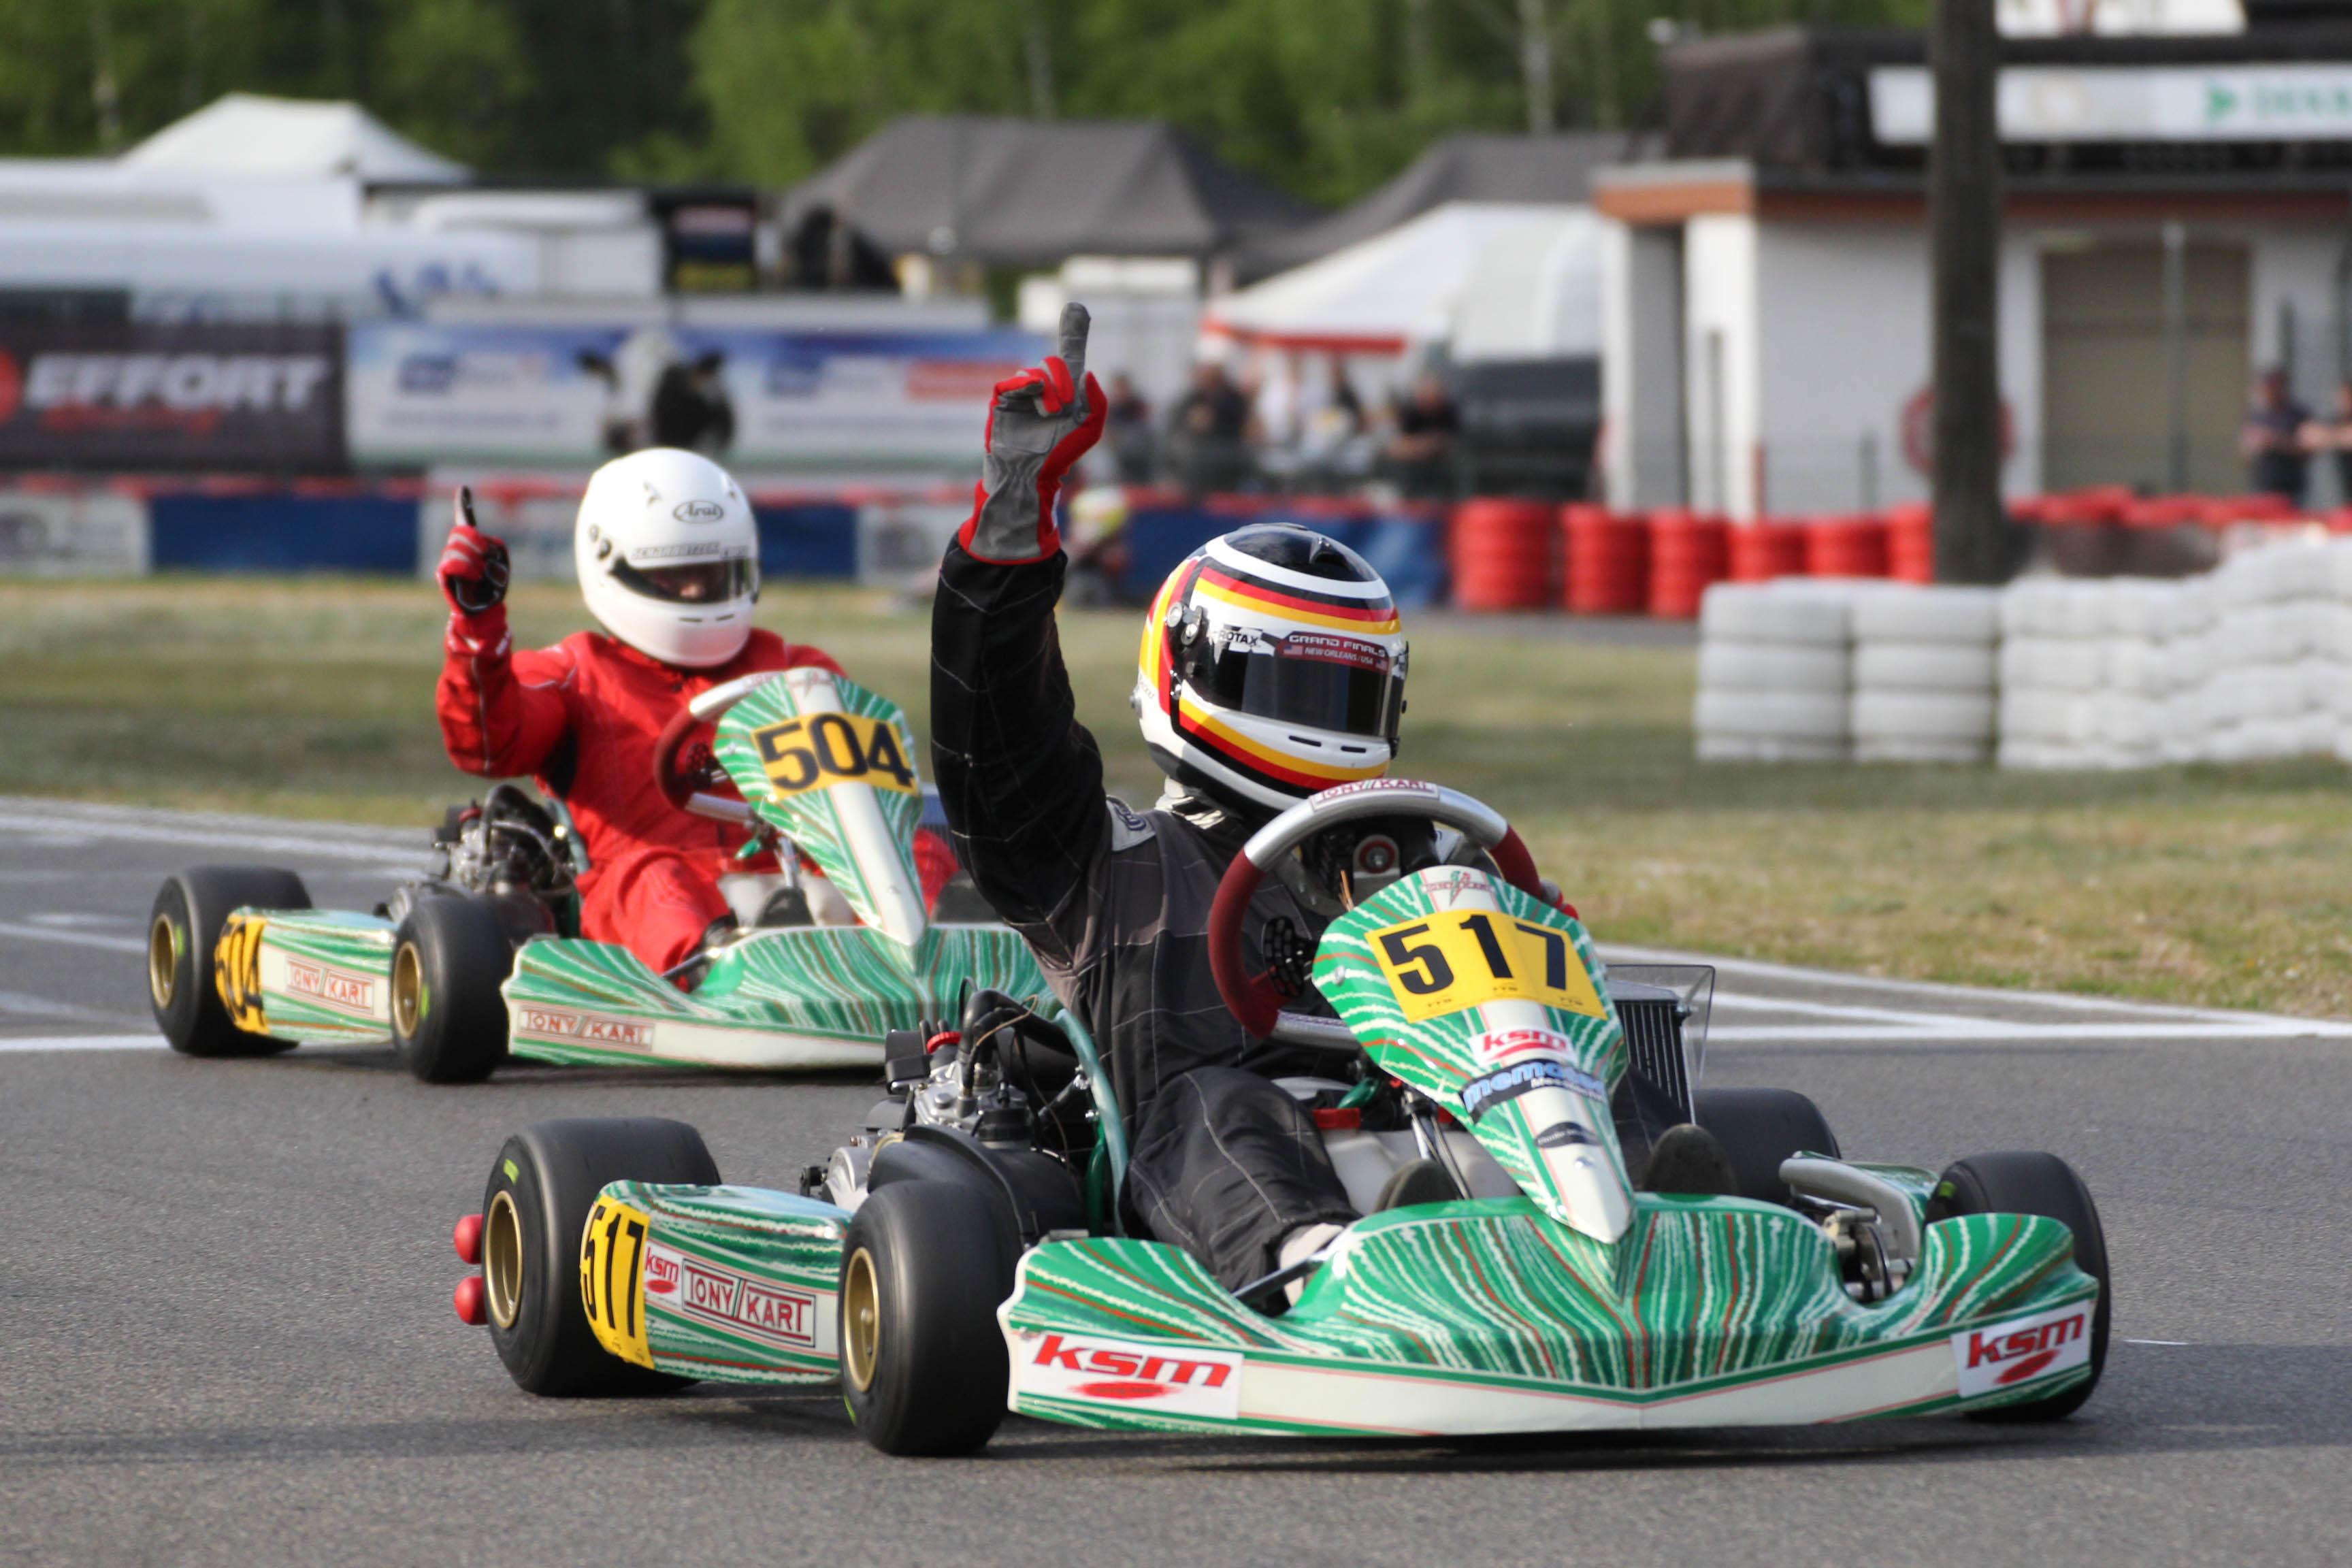 KSM Racing Team gewinnt RMC-Auftakt in Kerpen